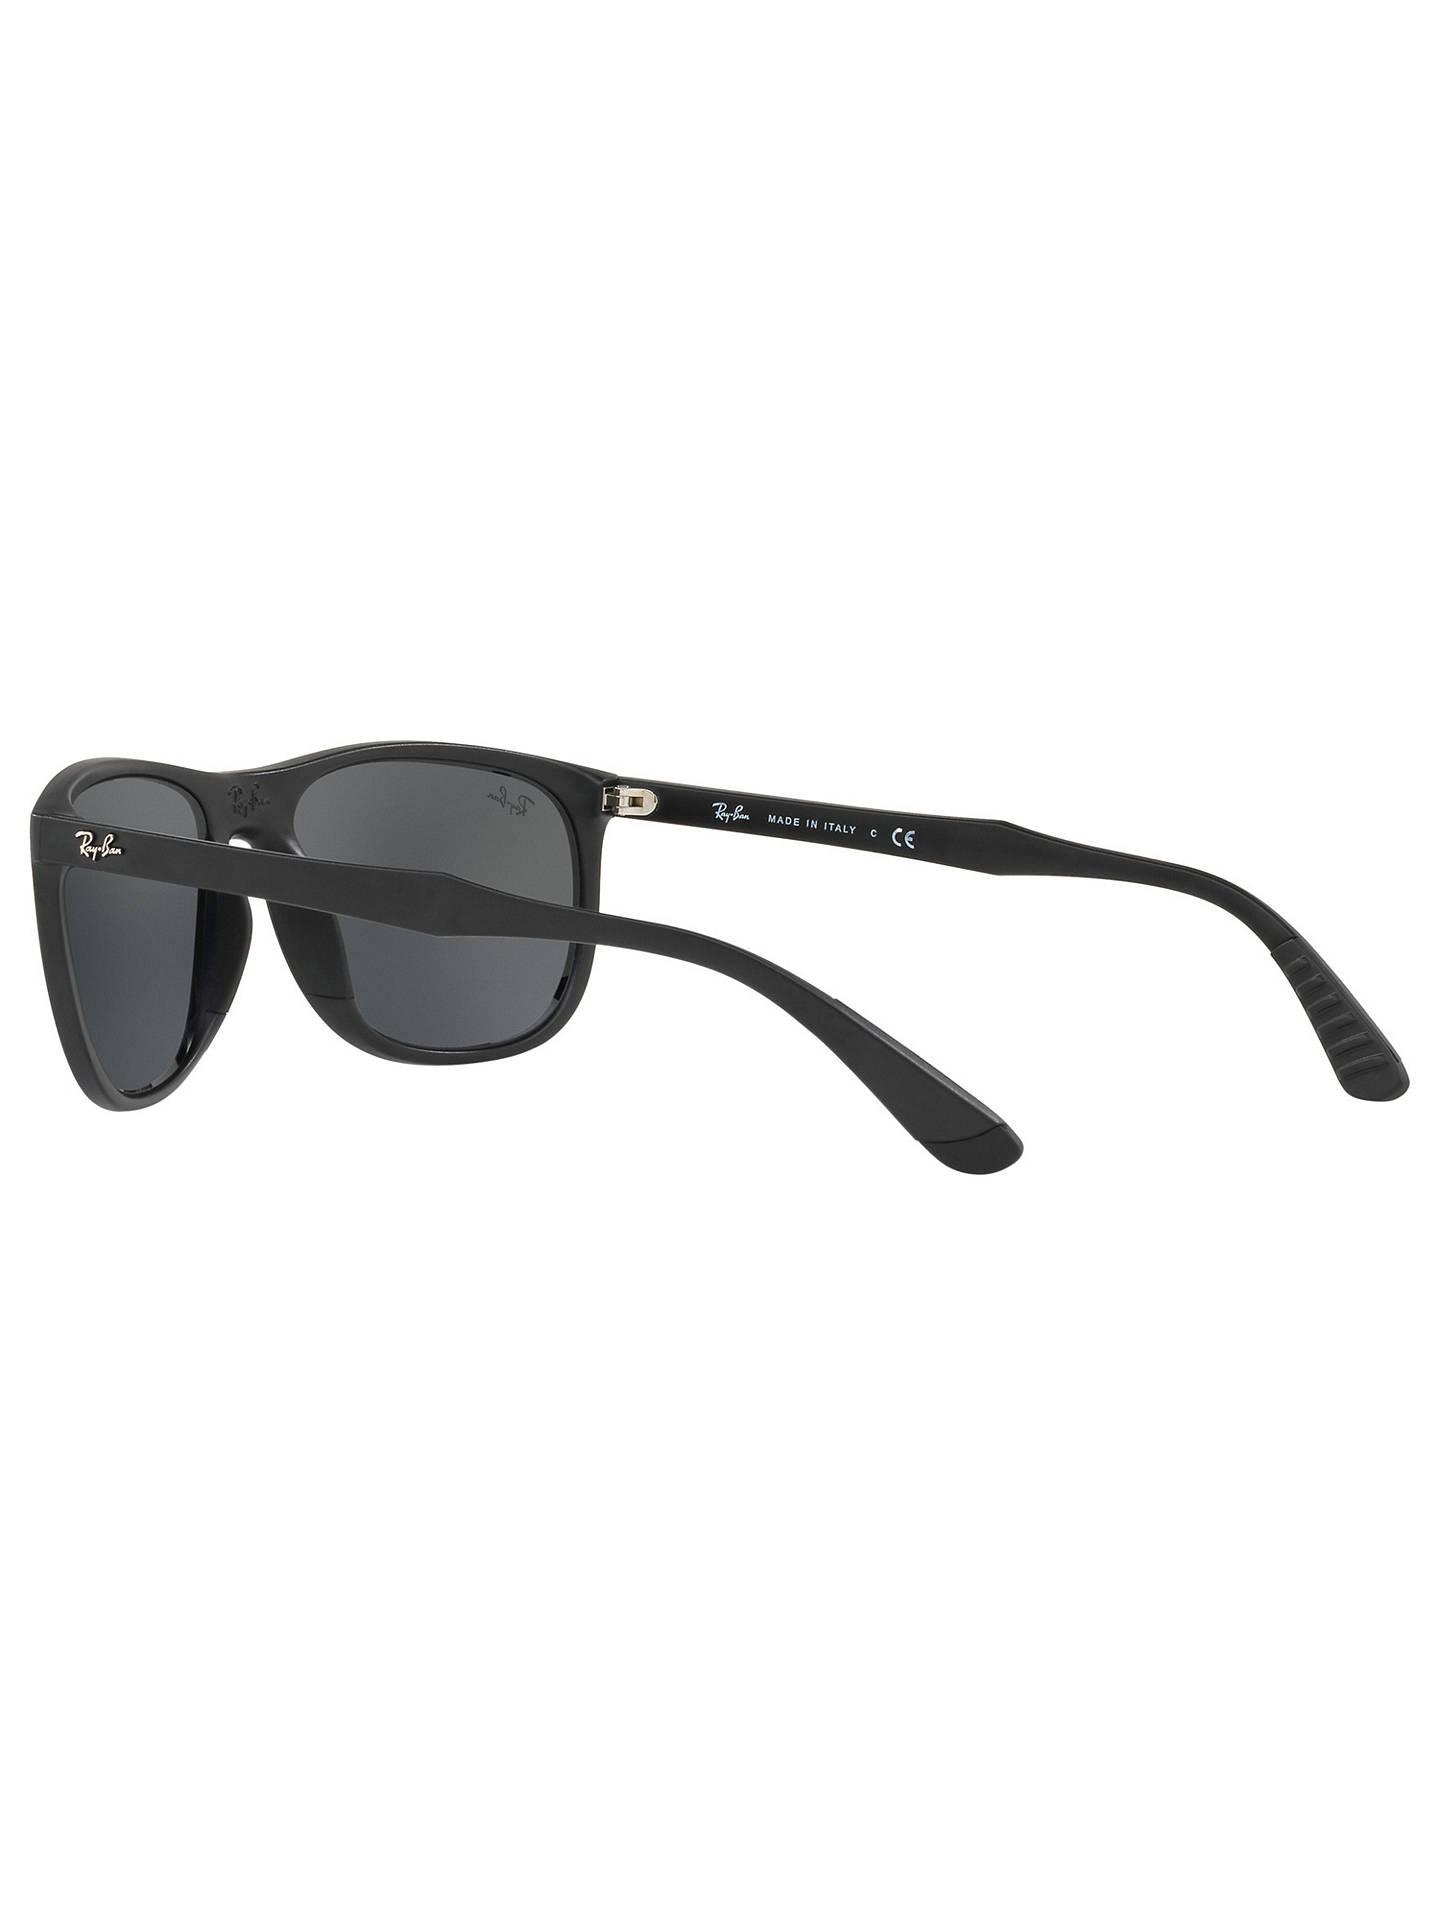 9a4338dba4 Ray-Ban RB4291 Square Sunglasses at John Lewis   Partners